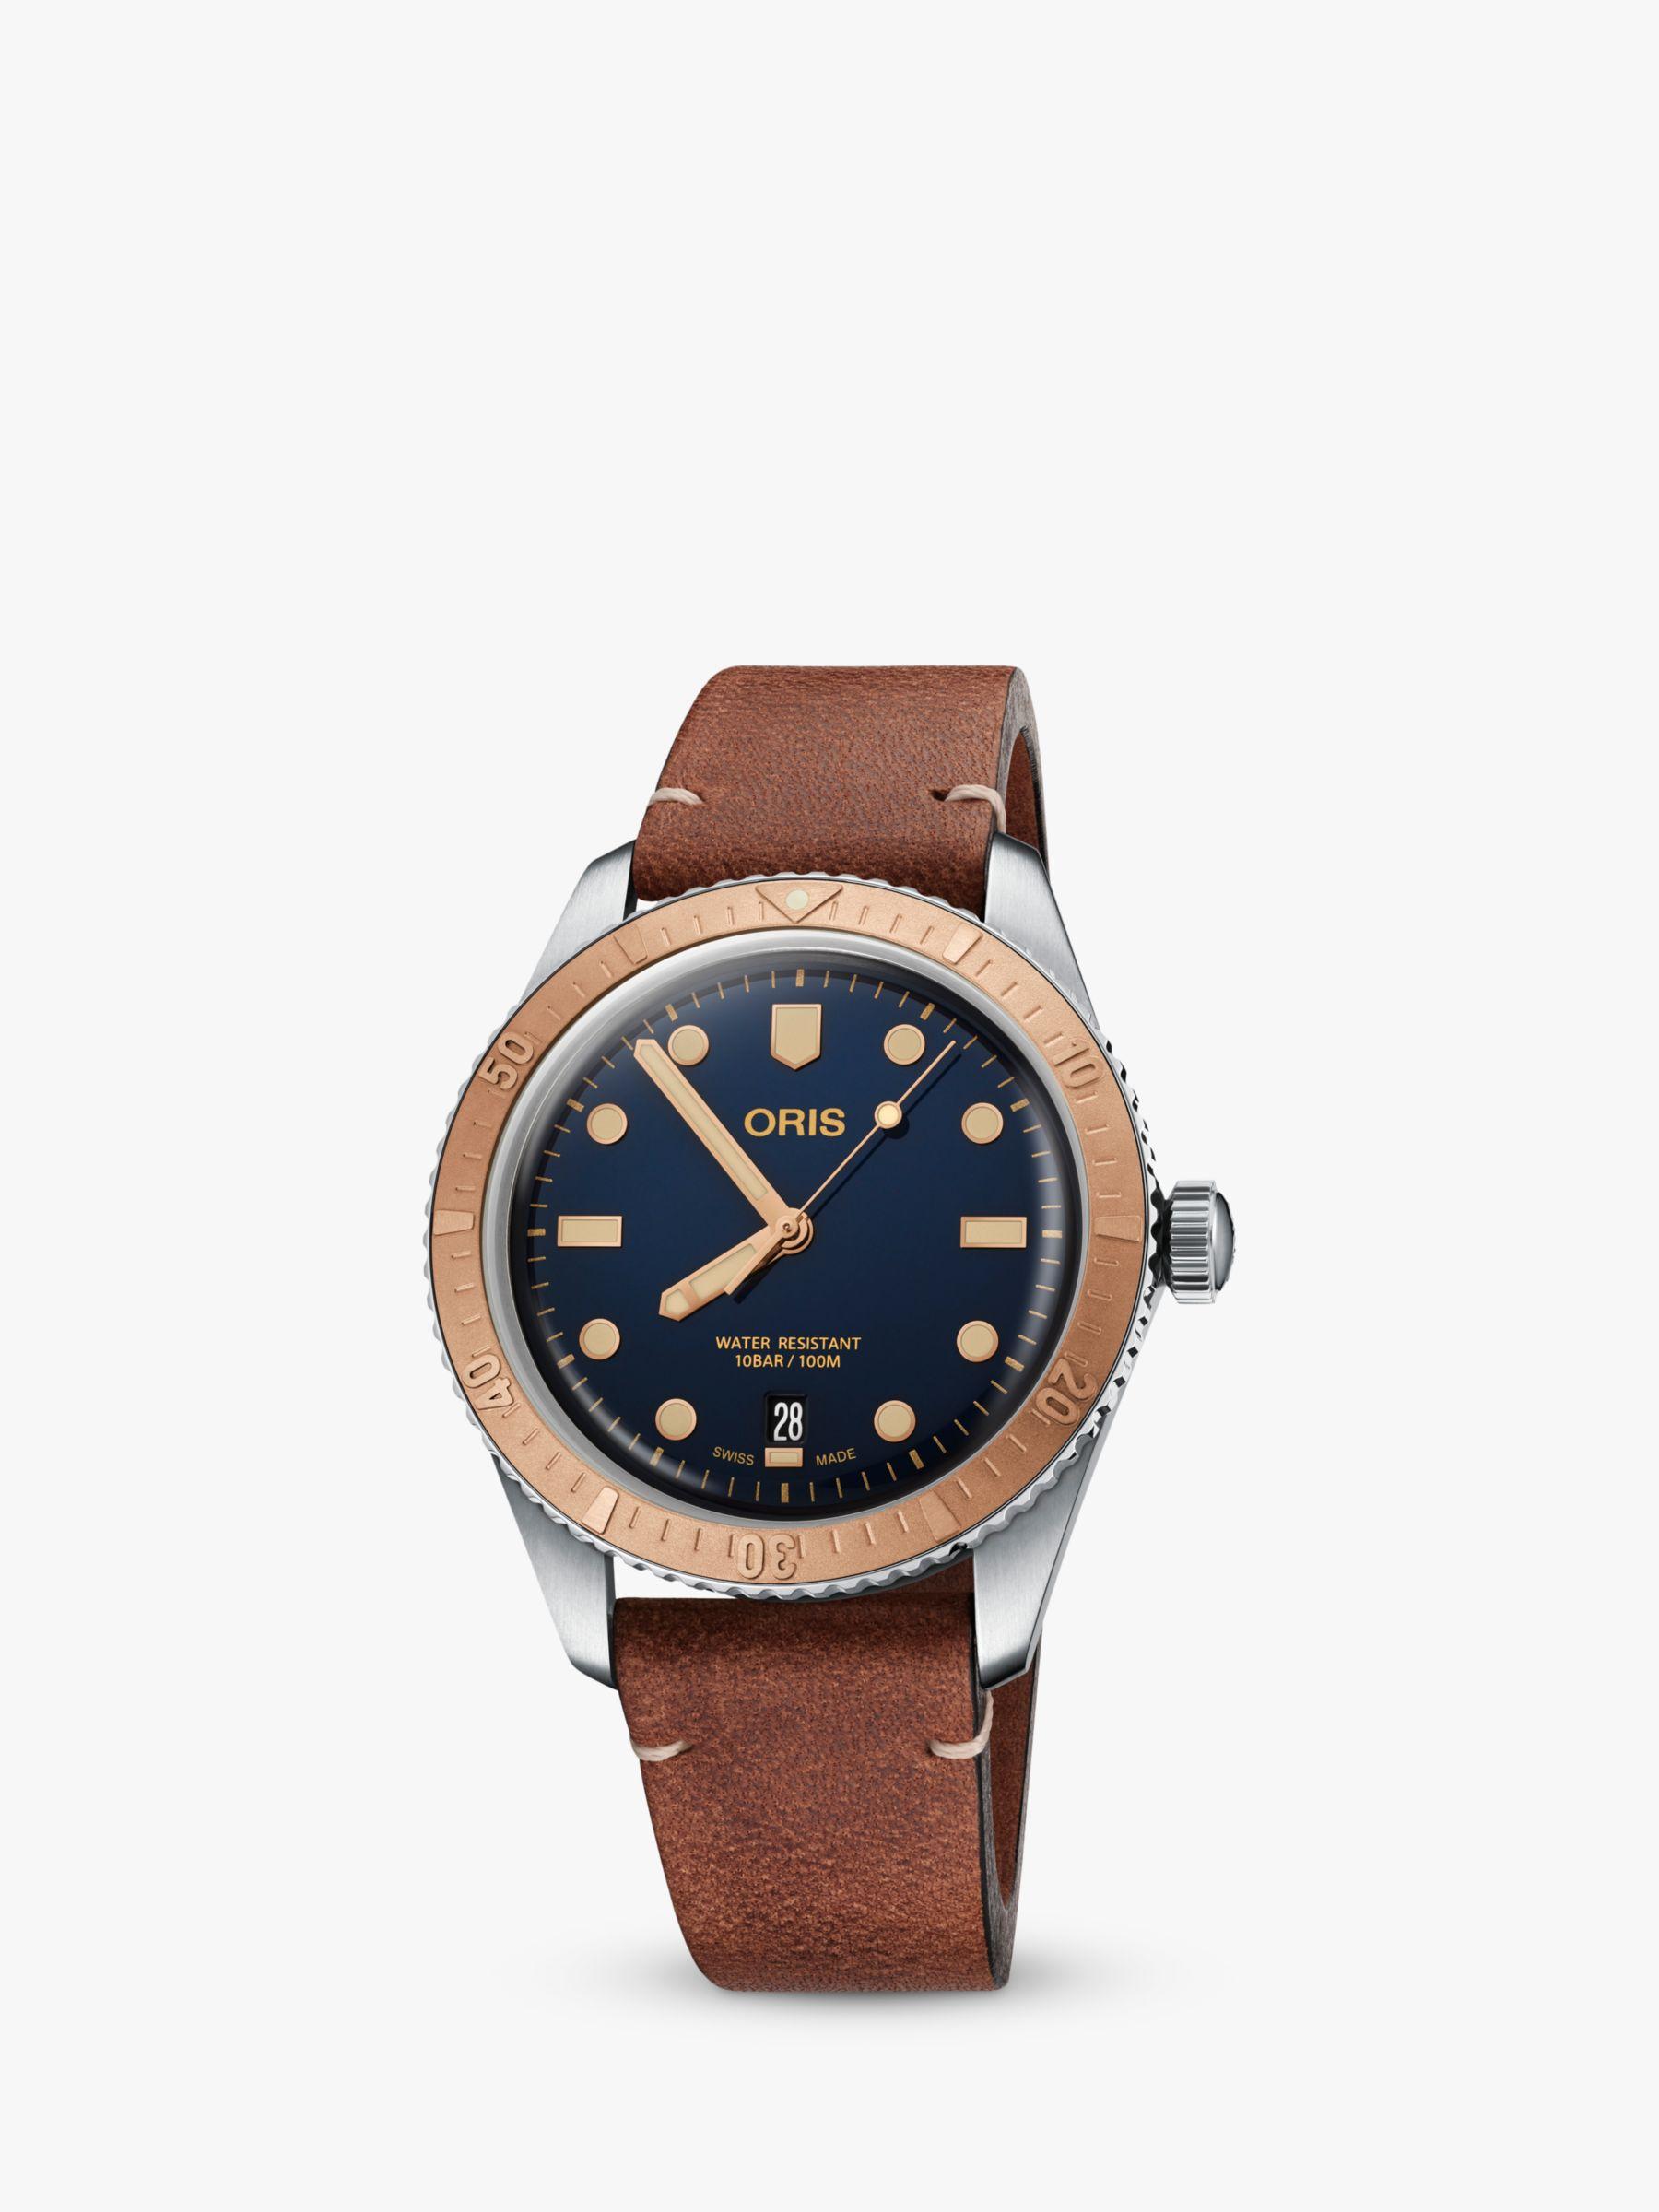 Oris Oris 73377074355-52045 Men's Divers 65 Automatic Date Leather Strap Watch, Brown/Blue